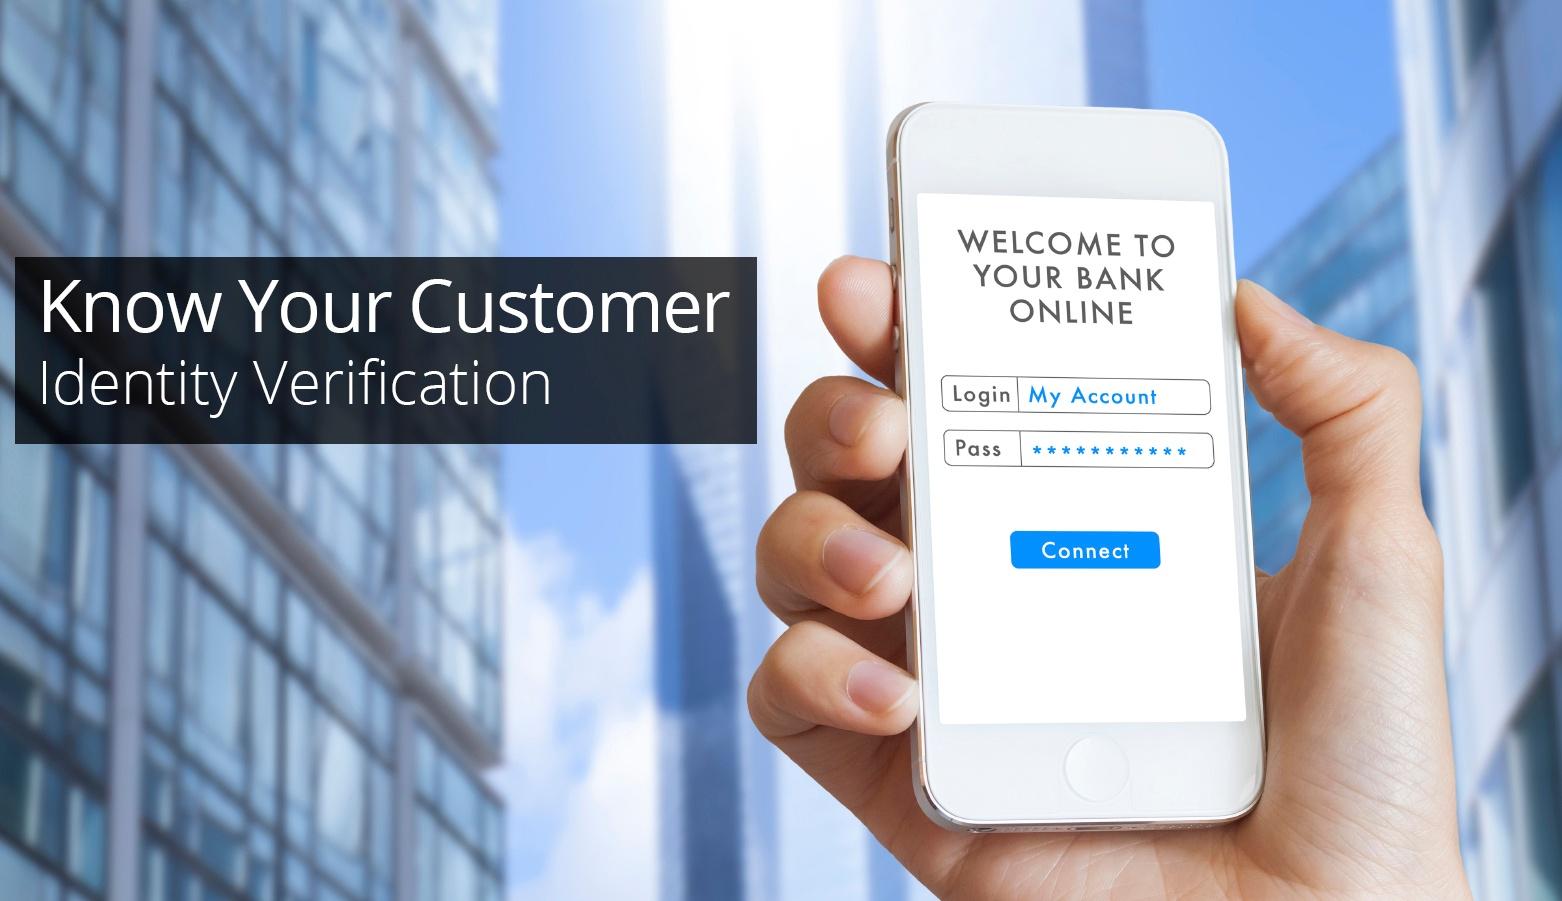 Identity_Verification_Know_Your_Customer